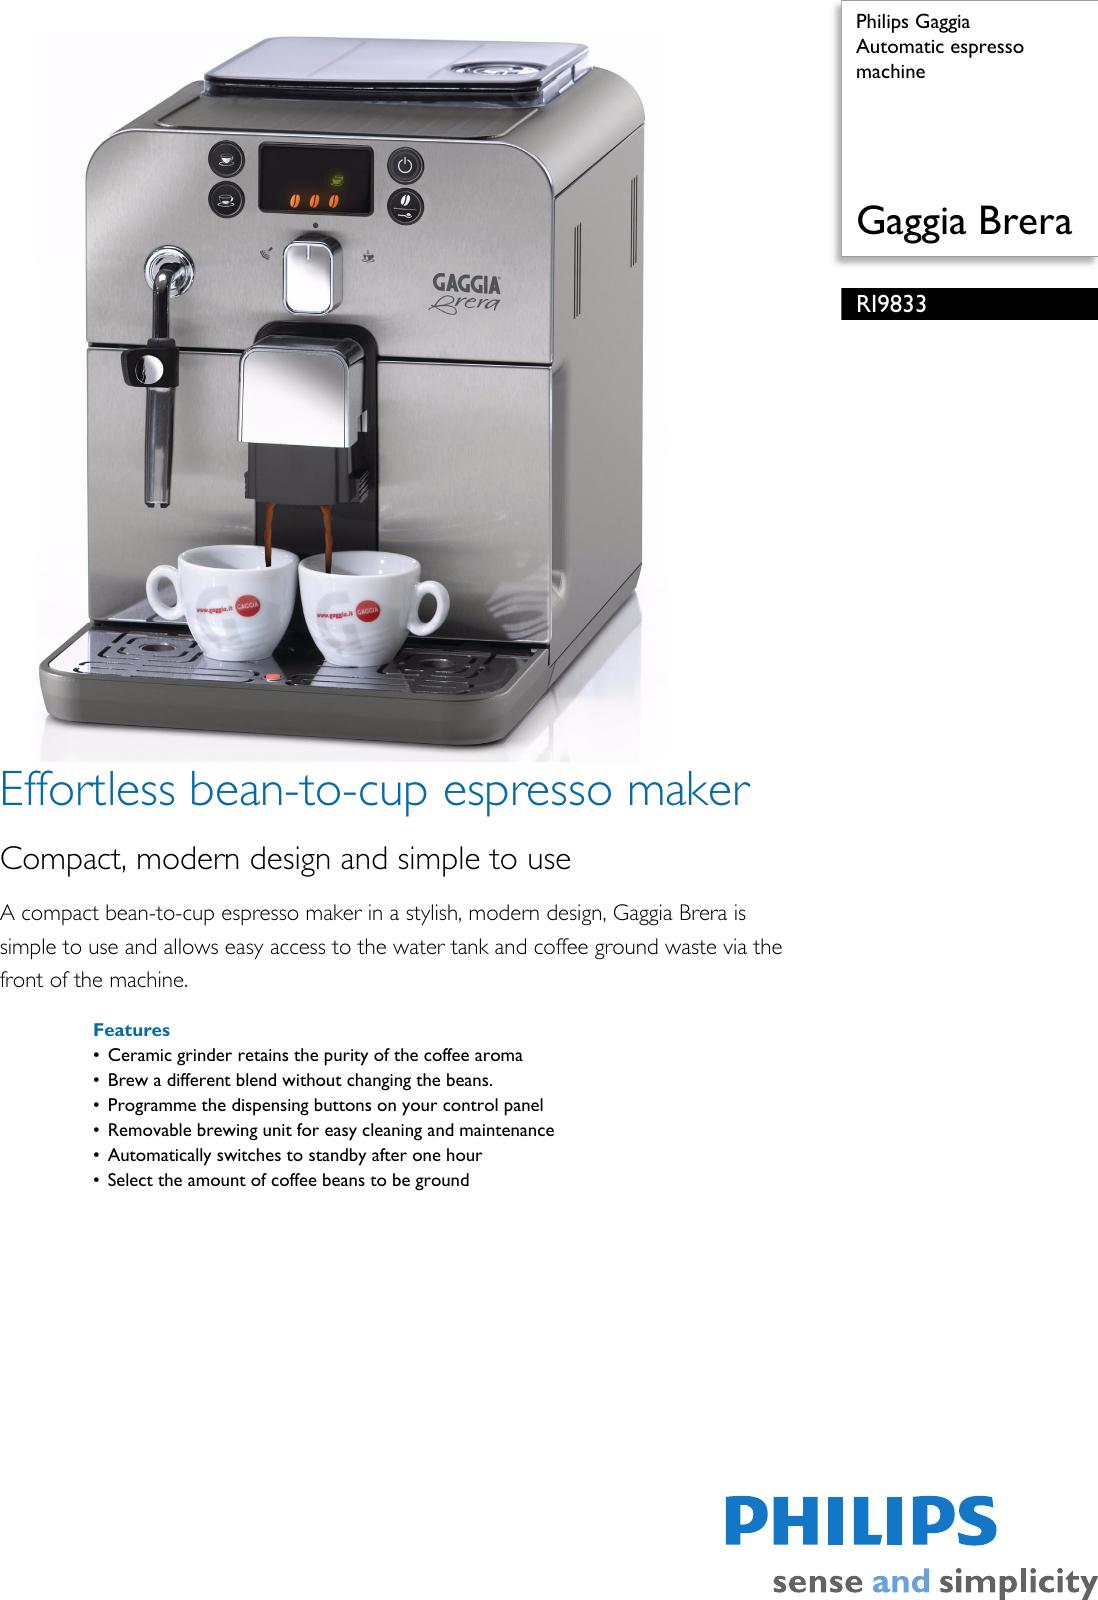 philips manual espresso machine